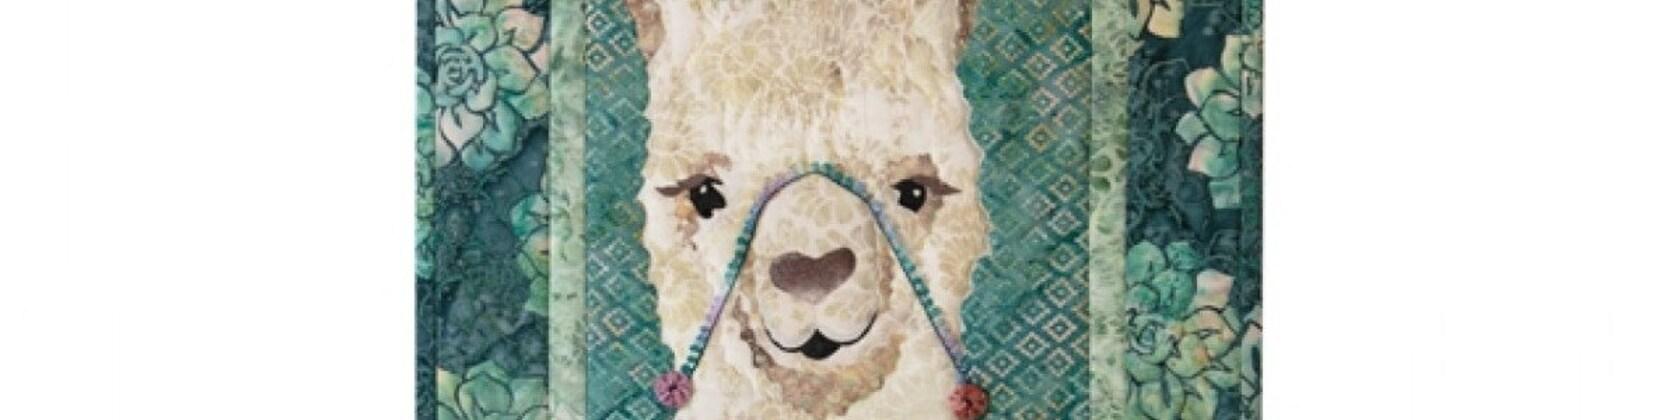 Hiver écureuil Tissu-Tissu Coussin Craft Quilting Panel-couture